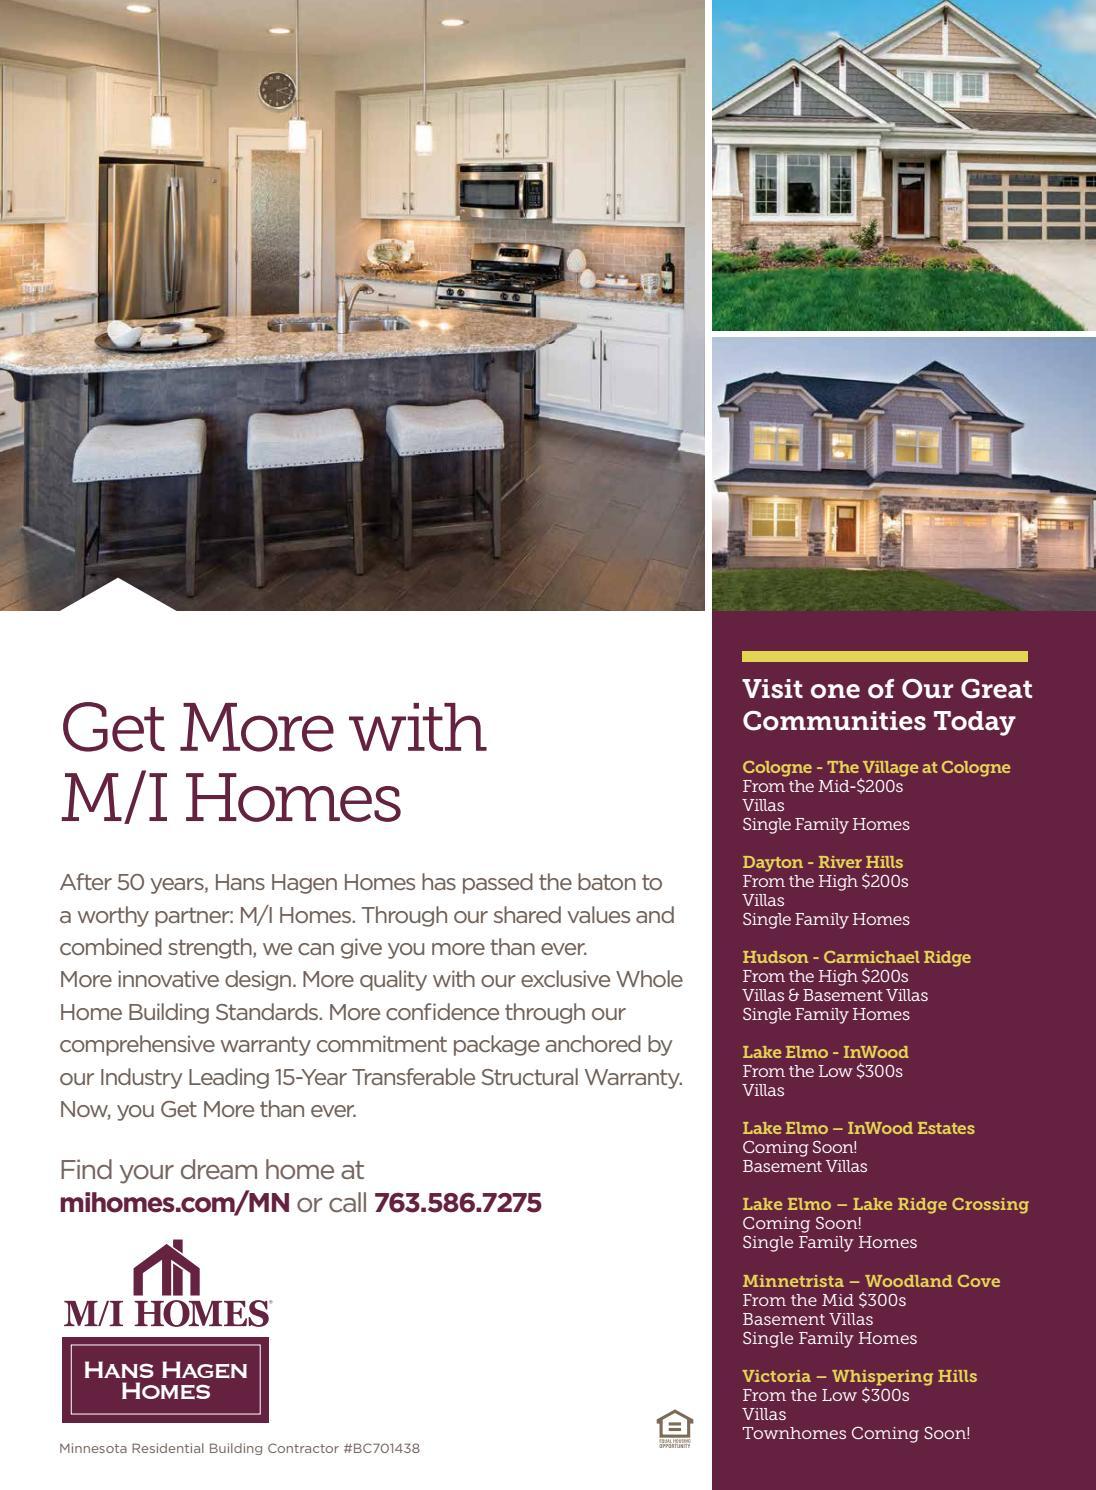 2017 Spring Parade of Homes(SM) Guidebook by BATC-Housing